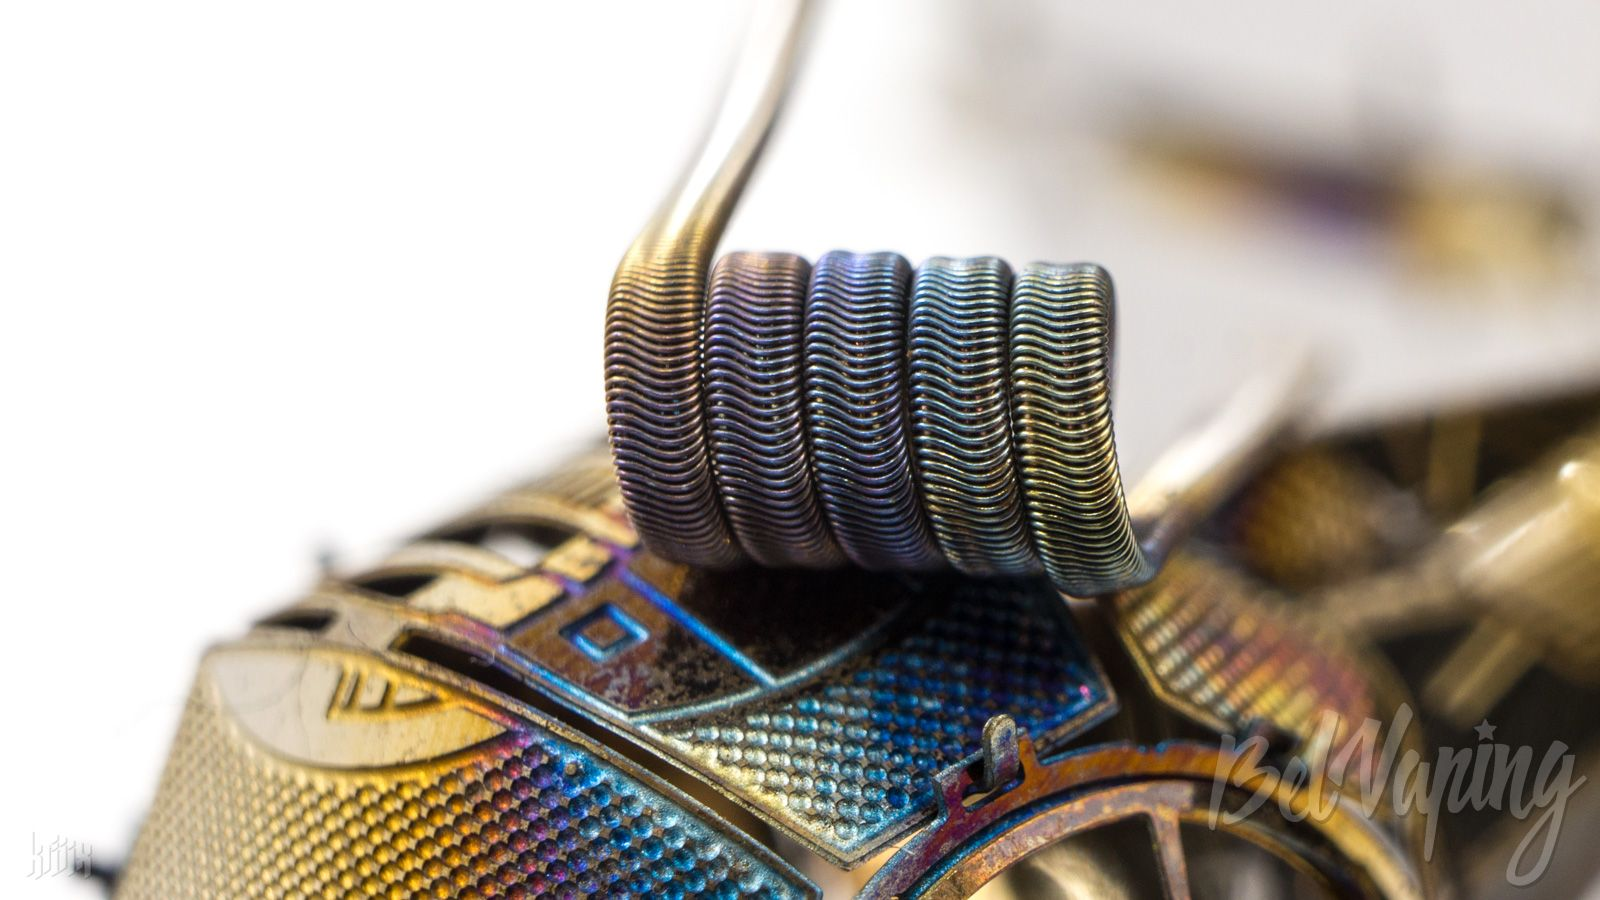 Тип спирали: Alien Clapton Coil (алиен коил)